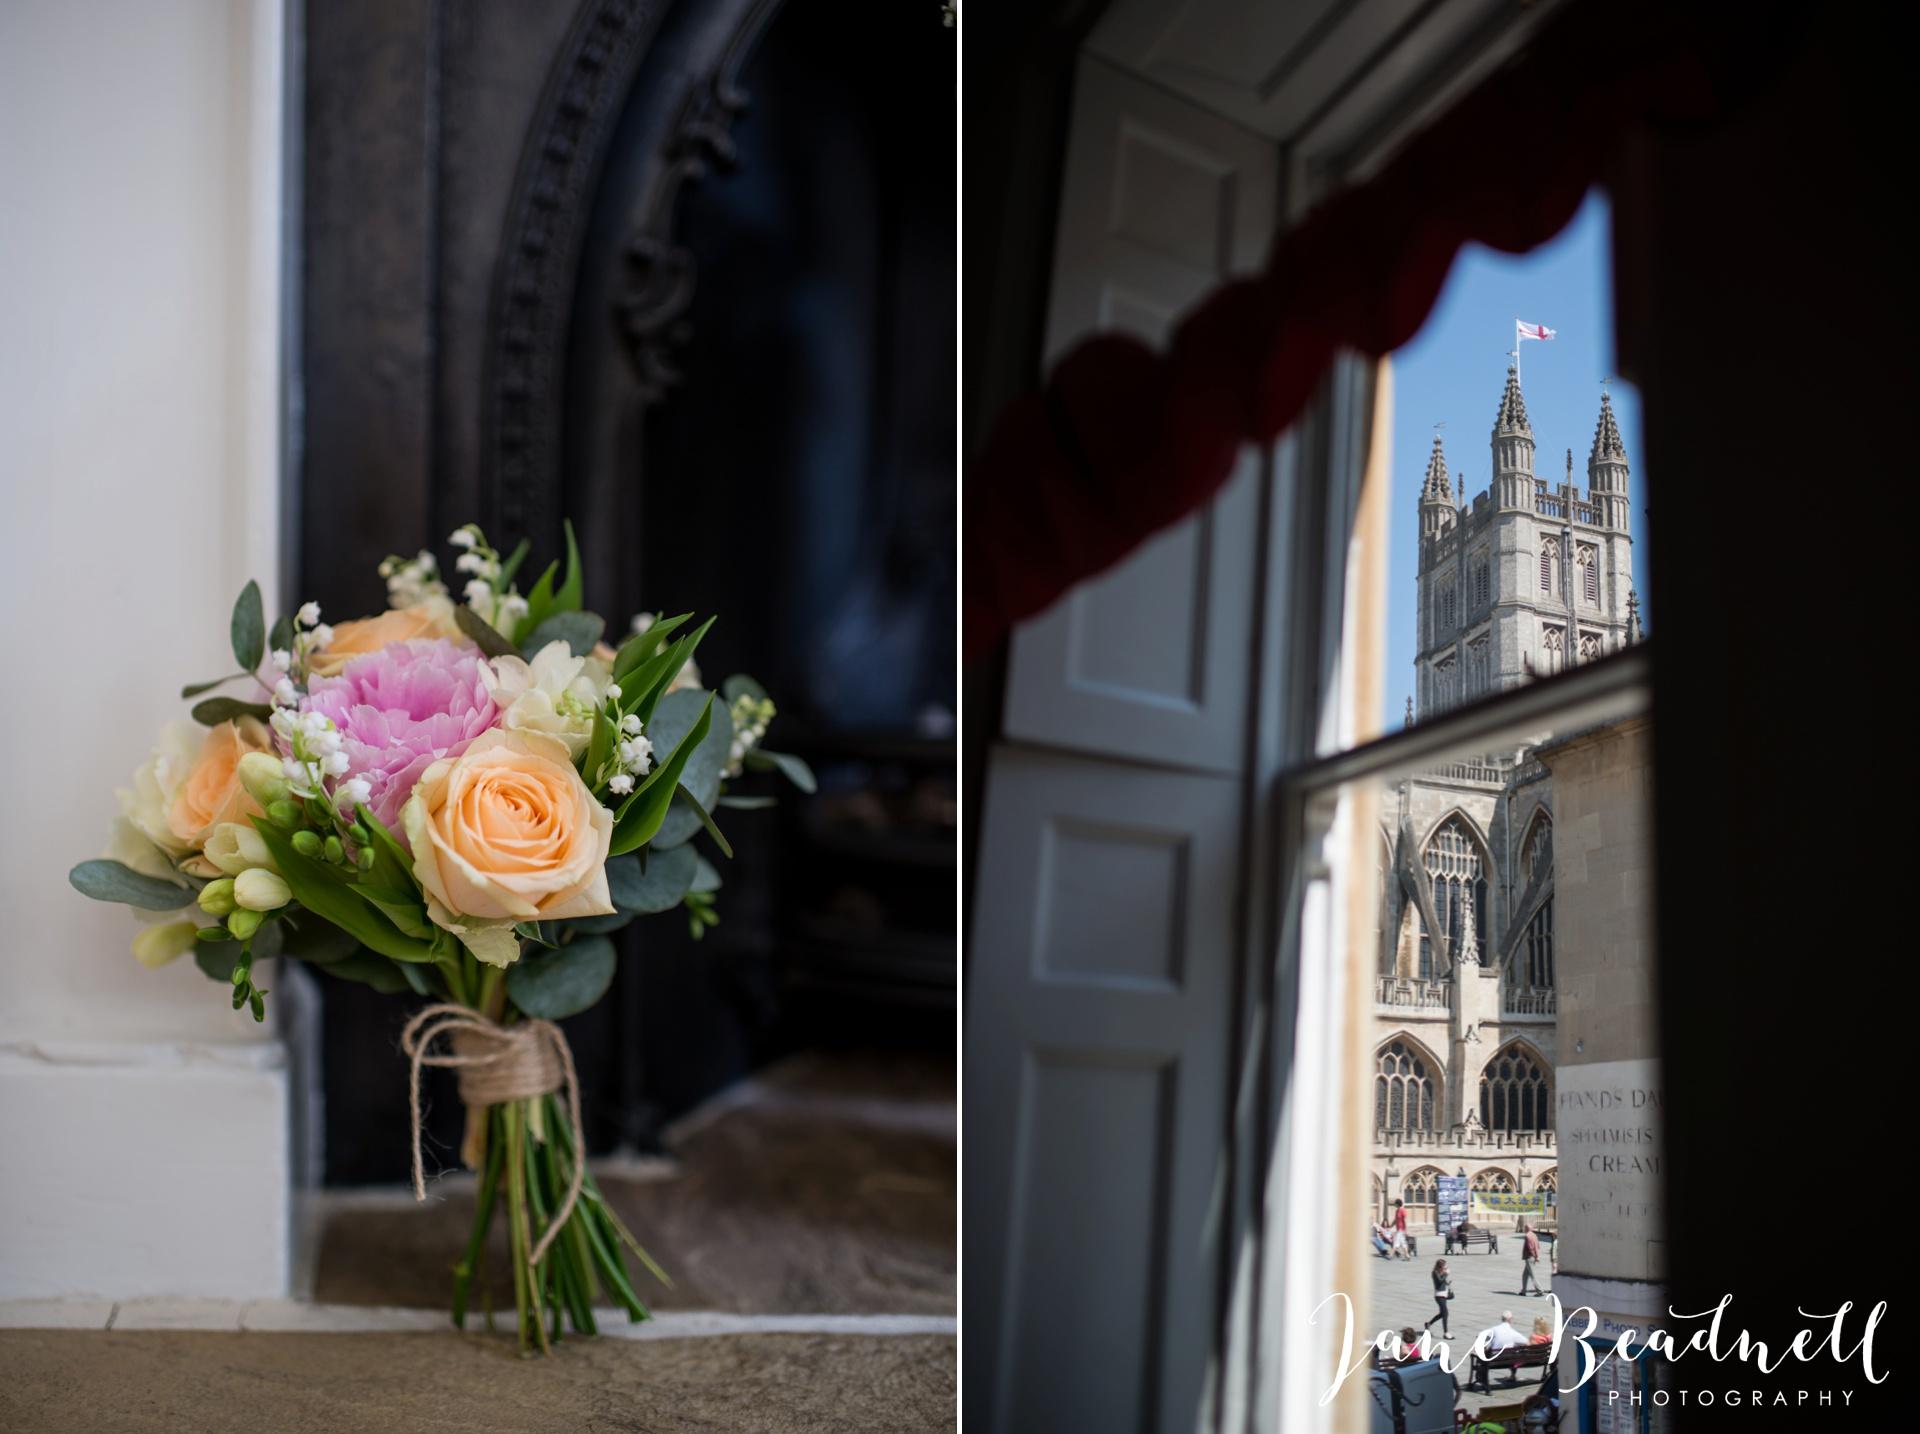 Bath Abbey wedding photography by fine art wedding photographer Leeds Jane Beadnell_1